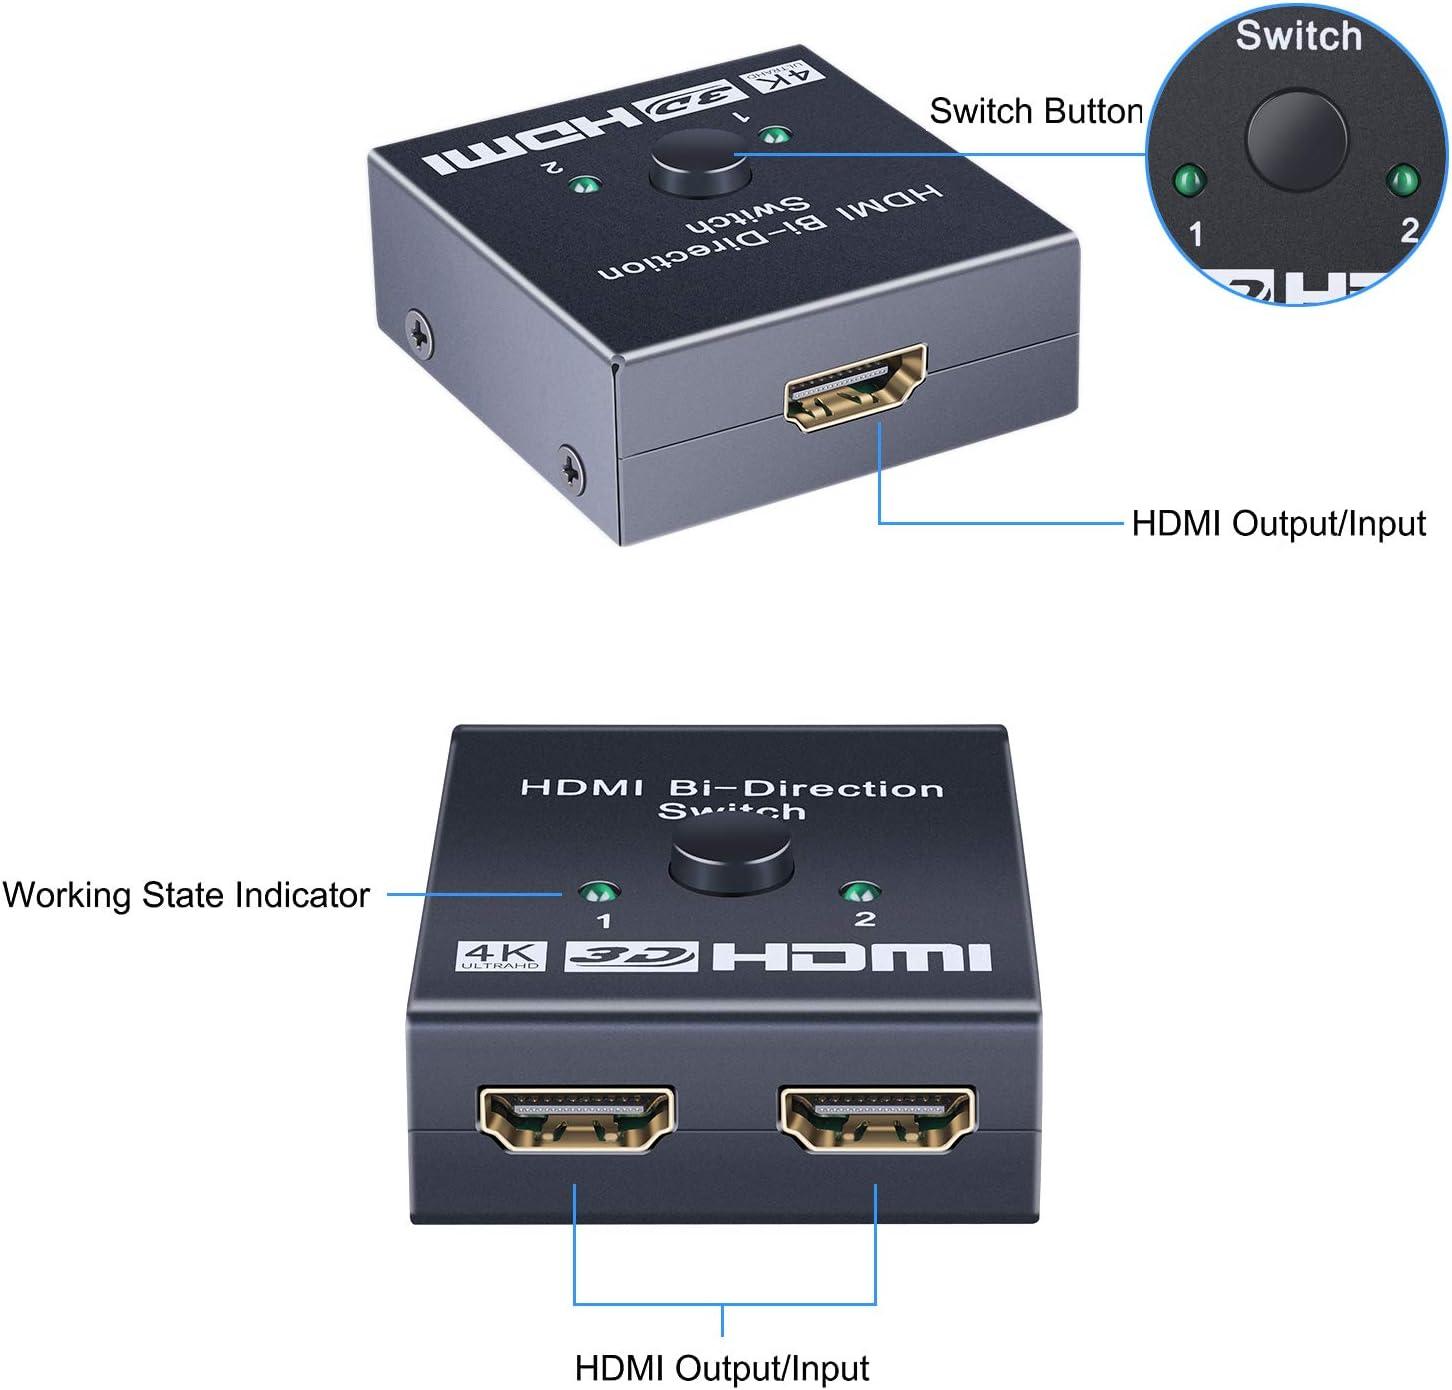 HDMI Switch 4K HDMI Splitter Fire Stick Supports 4K/3D/1080/HDCP ...